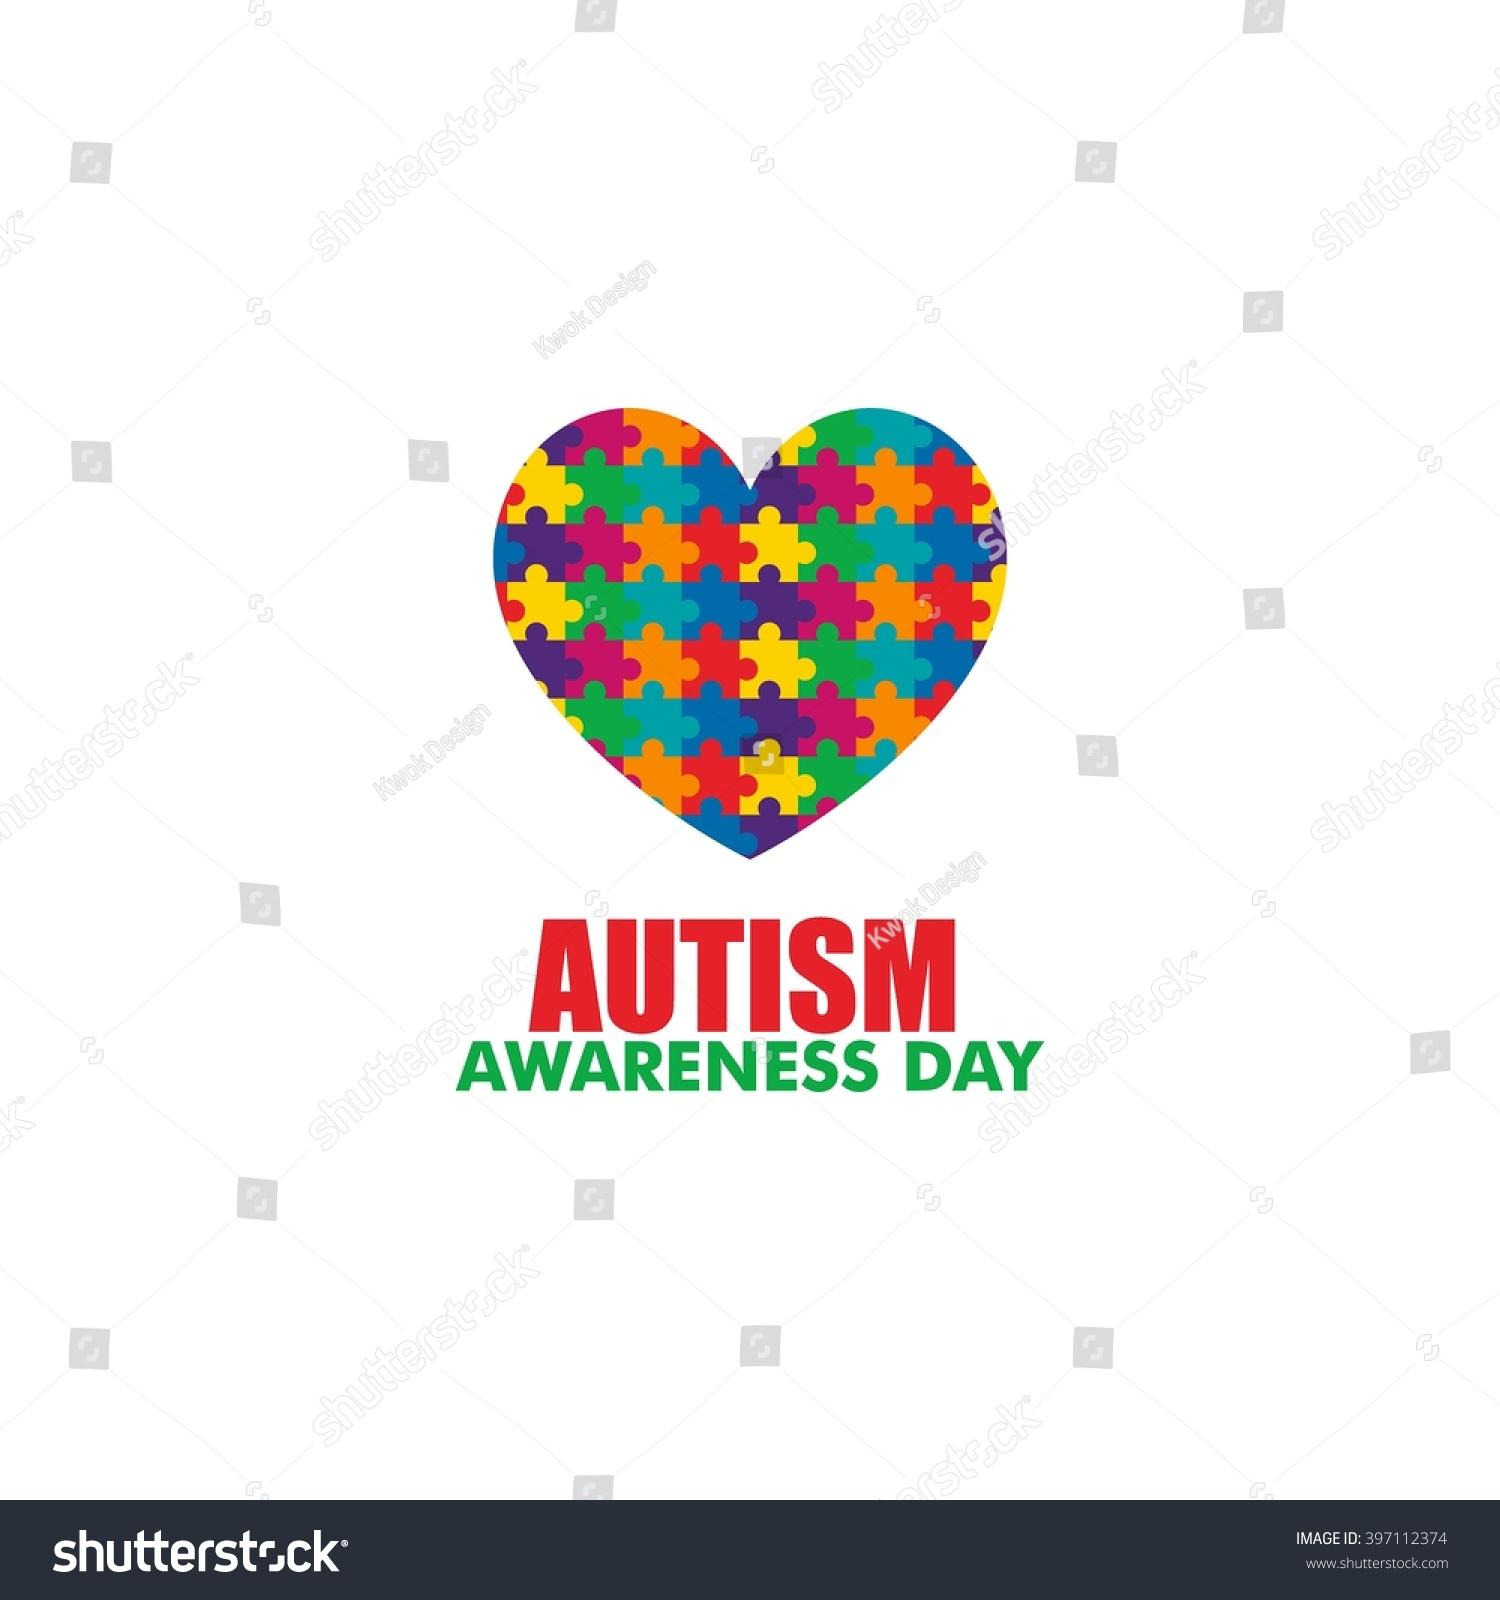 World autism awareness day logo design stock vector 397112374 world autism awareness day logo design template vector illustration colorful puzzles symbol biocorpaavc